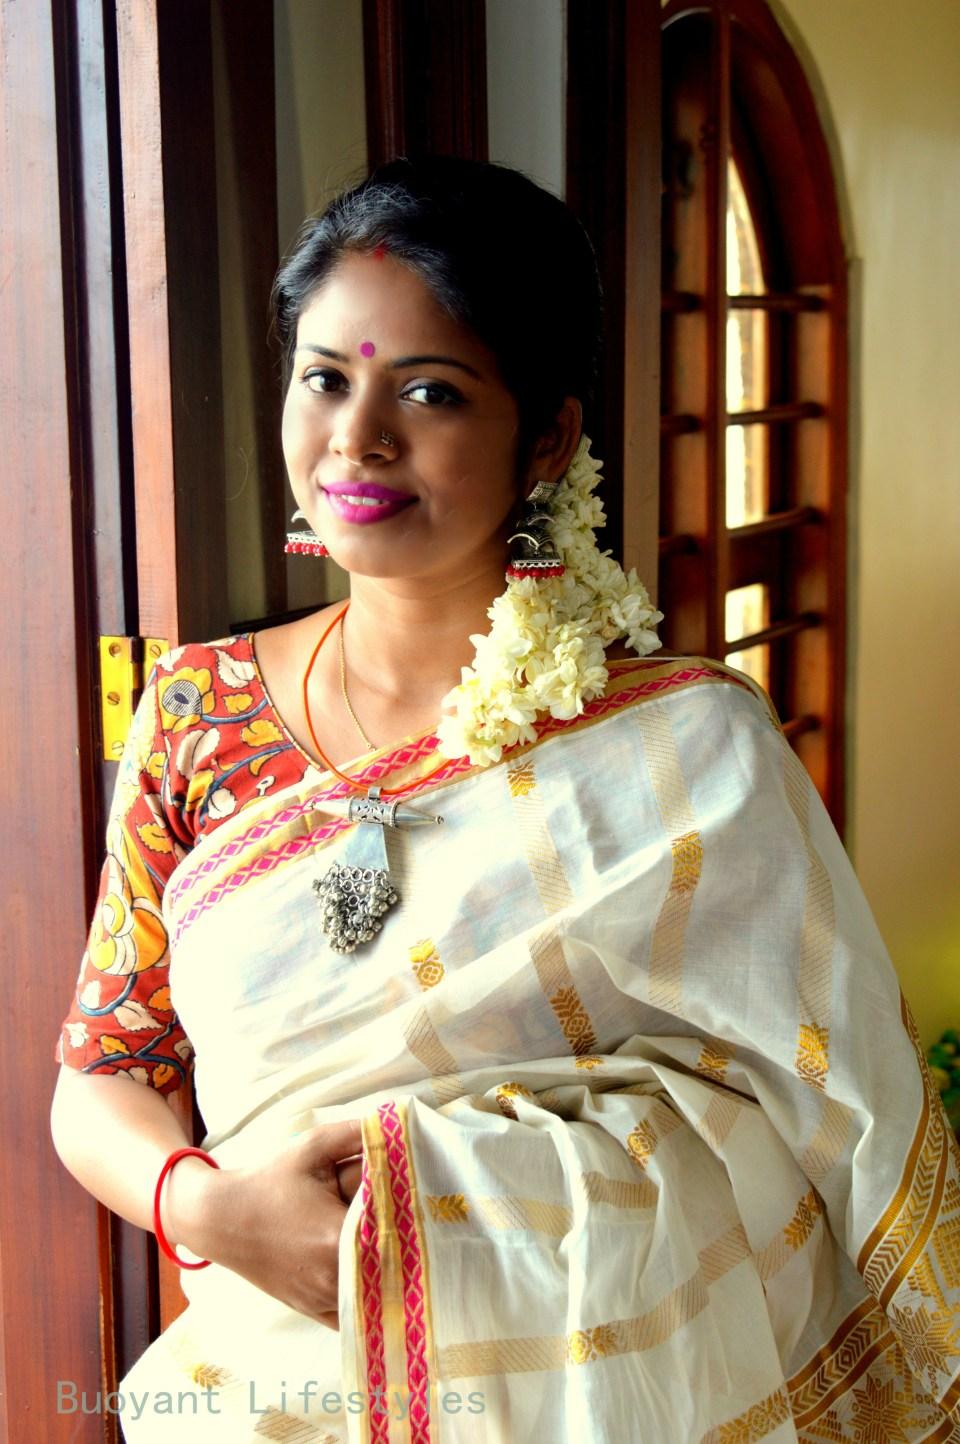 #Kerala #travelitinerary #godsowncountry #travelblogger #incredibleindia